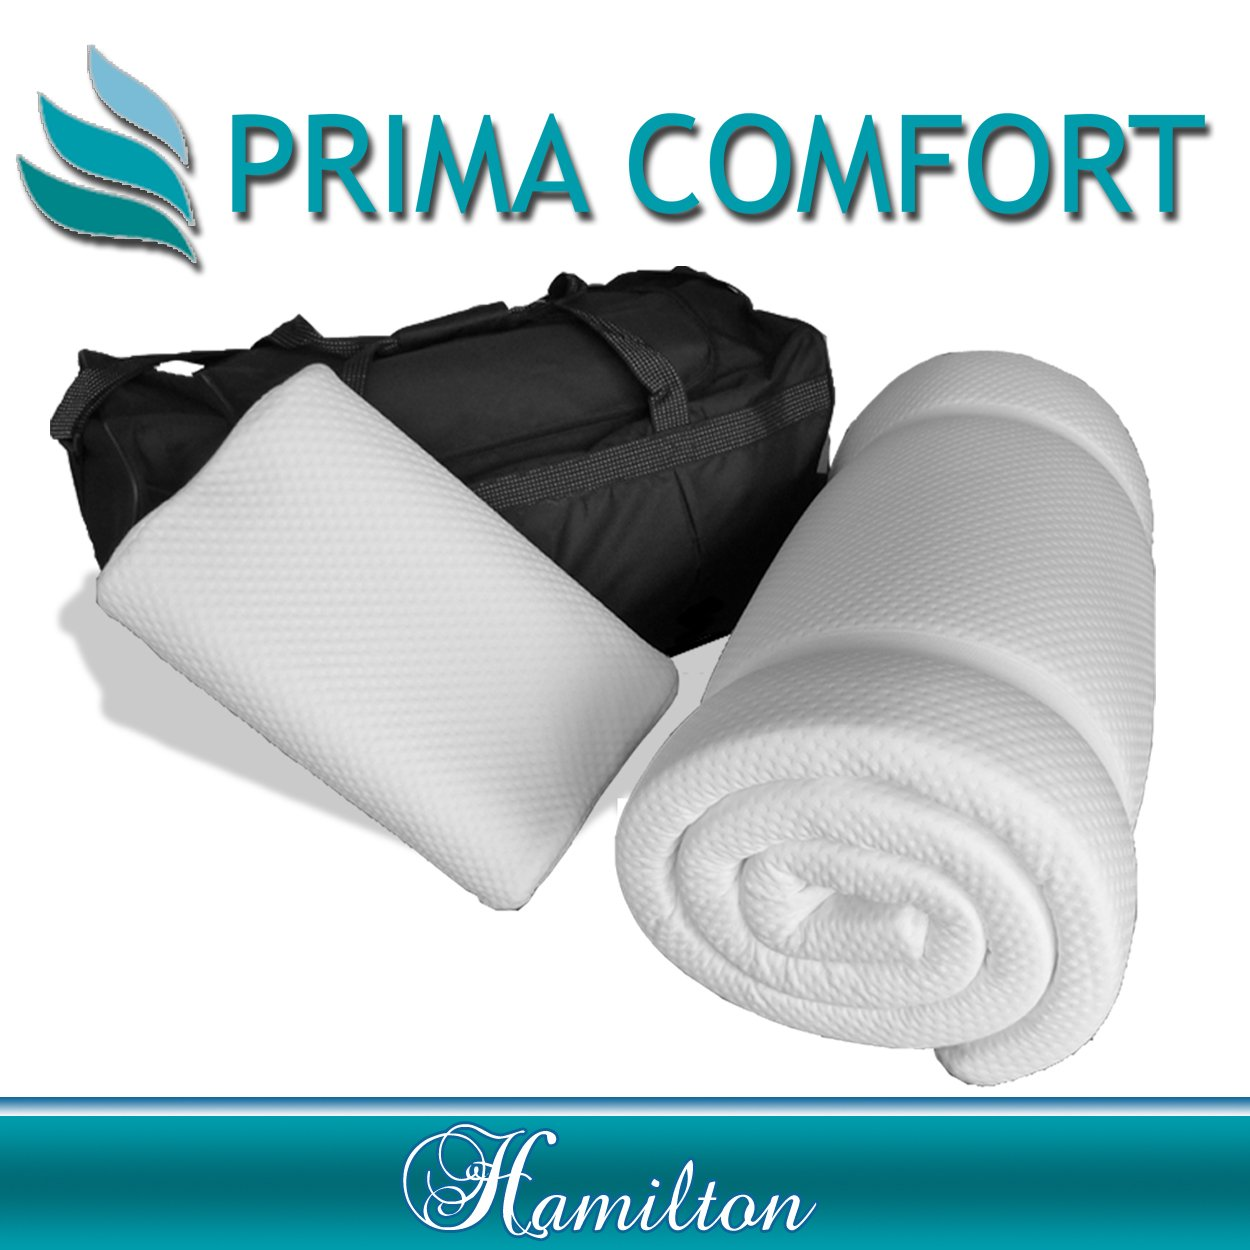 Prima Comfort Travel Memory Foam Mattress Topper plus Pillow   The Hamilton  7 DAY MONEY BACK GUARANTEE!!! includes Memory Foam Travel Pillow and holdall bag! (Mattress 190cm x 70cm x 3.5cm)       review